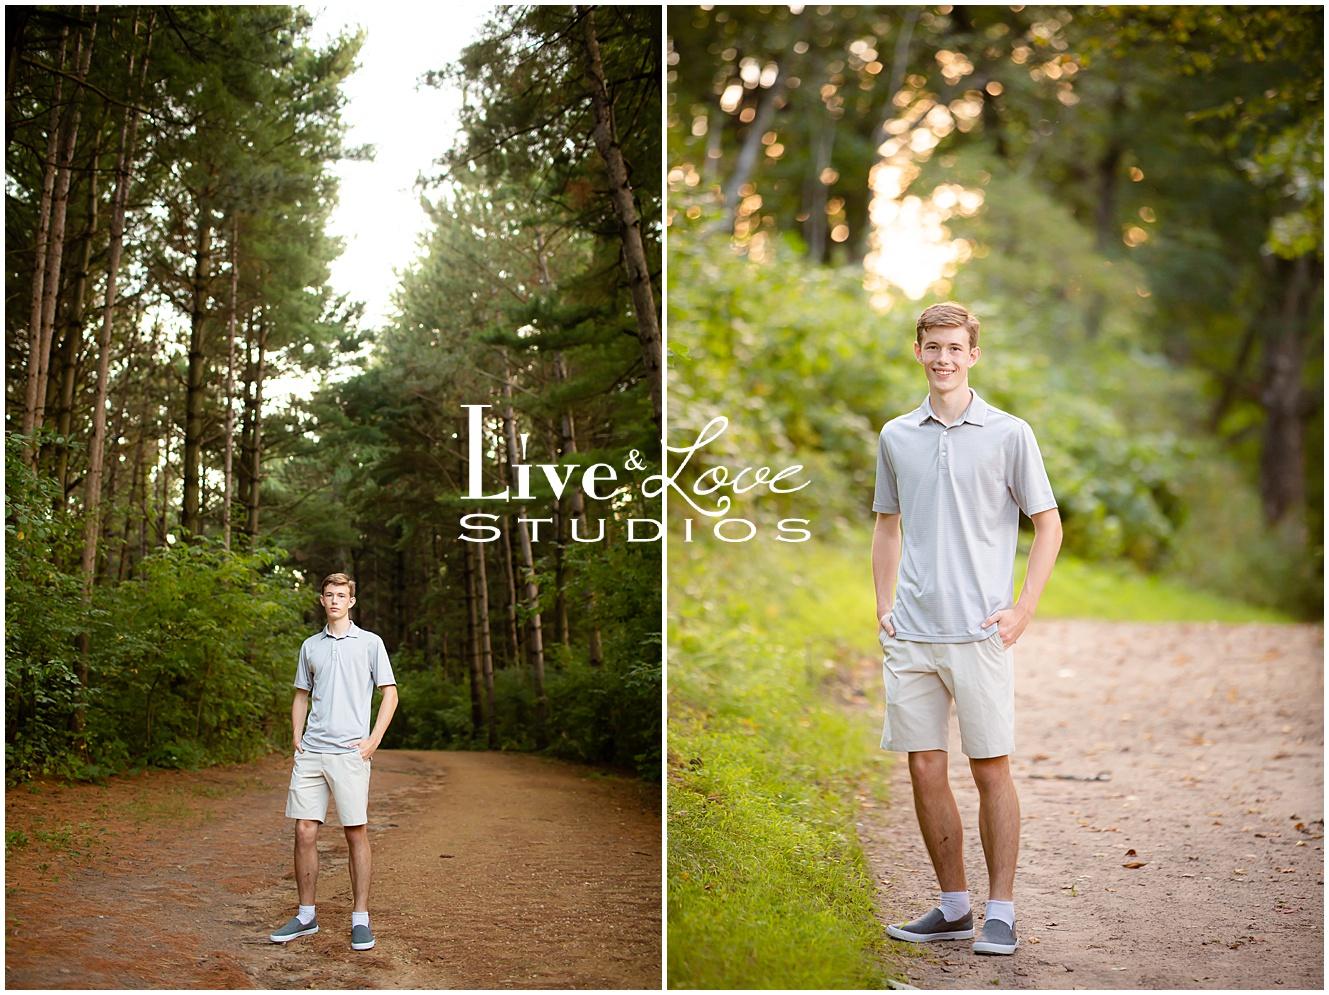 eagan-mn-high-school-senior-photographer_0636.jpg